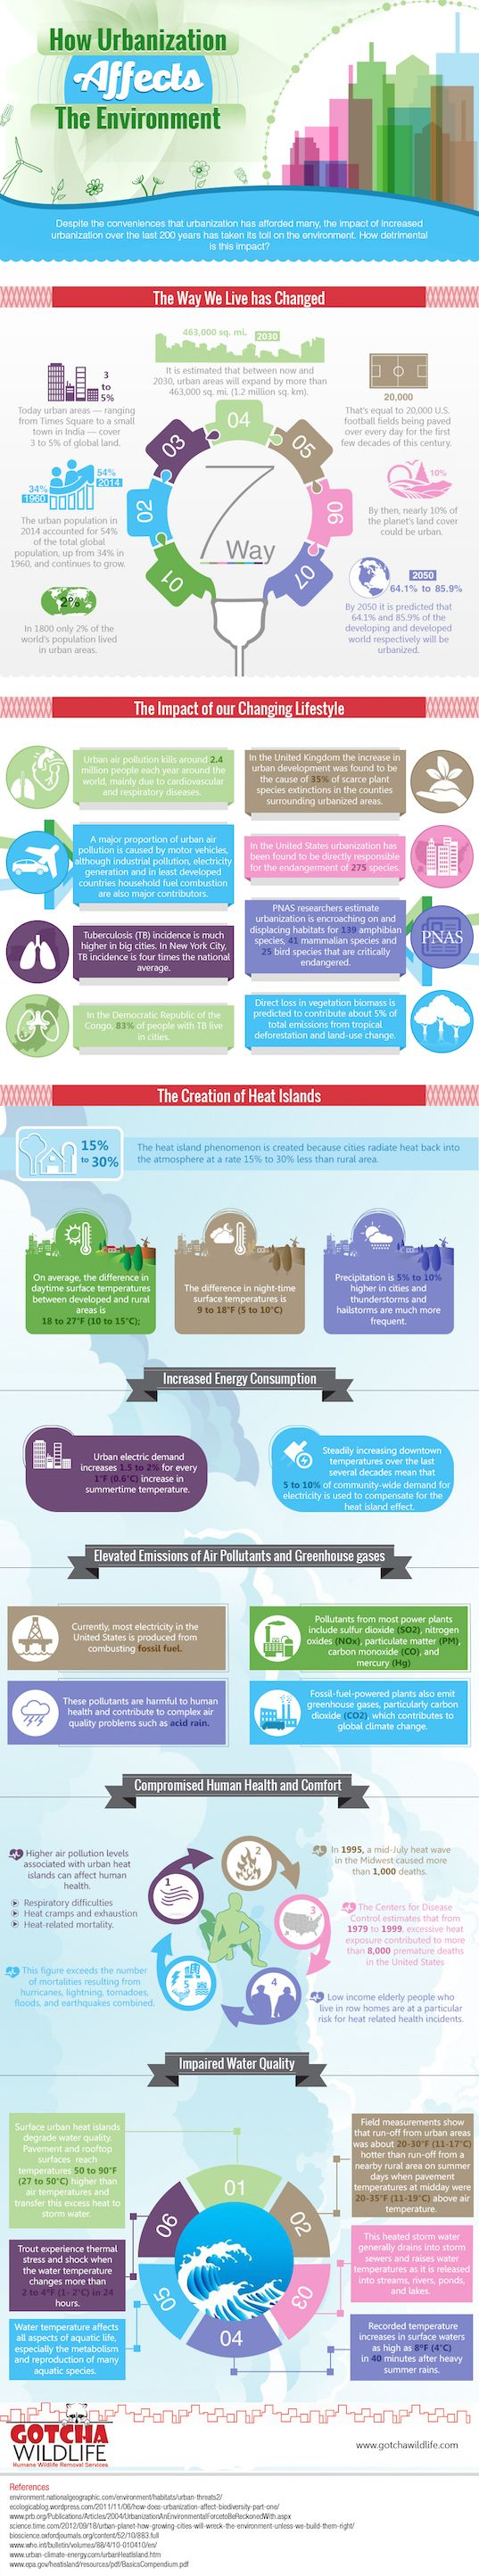 infographic, reader submitted content, Gotcha Wildlife, urbanization, urbanization impact on the environment, heat island effect